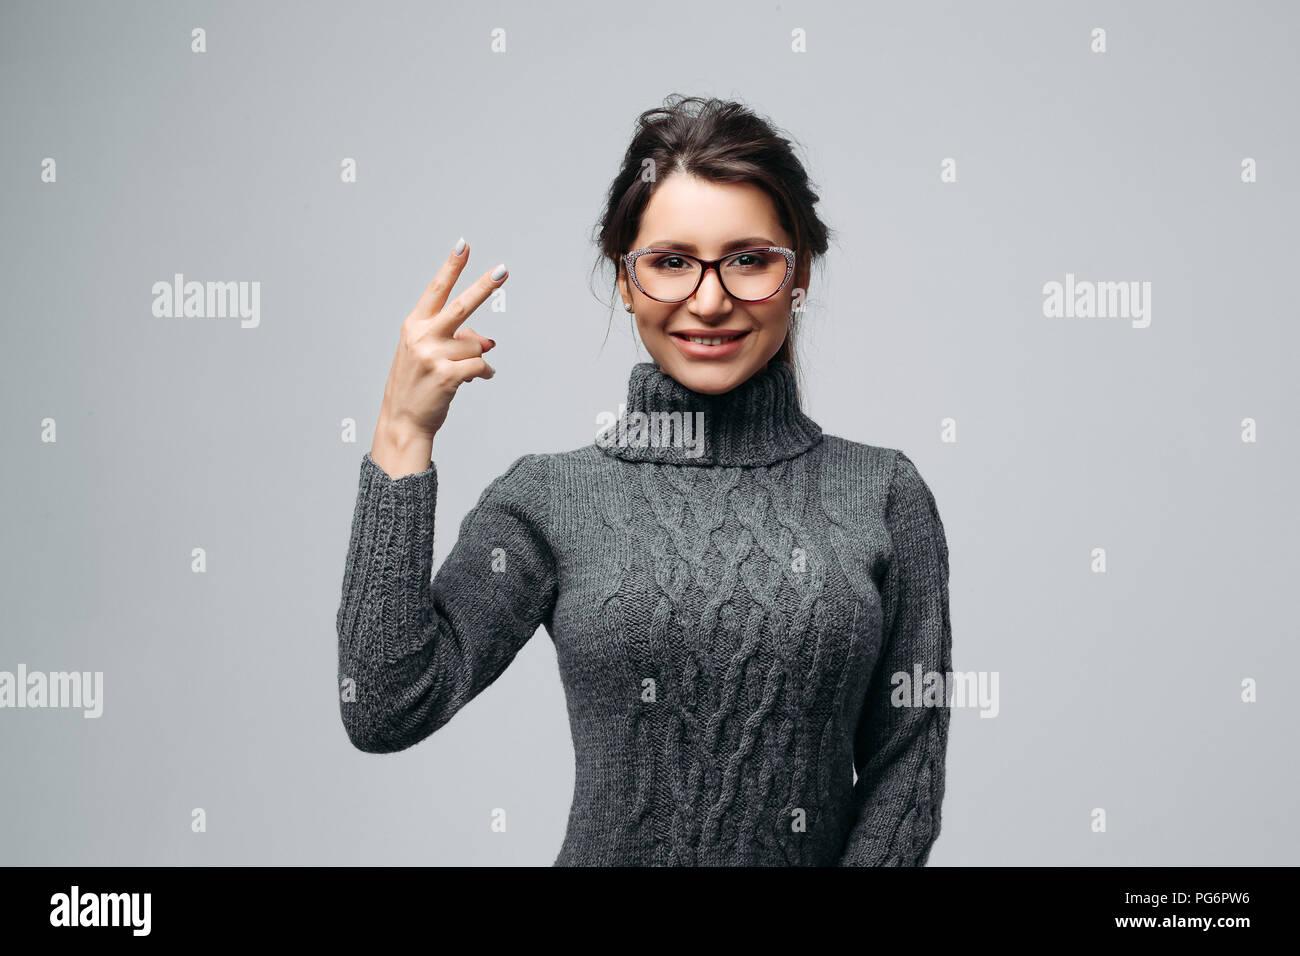 Joyous girl in glasses demonstrating victory sign - Stock Image